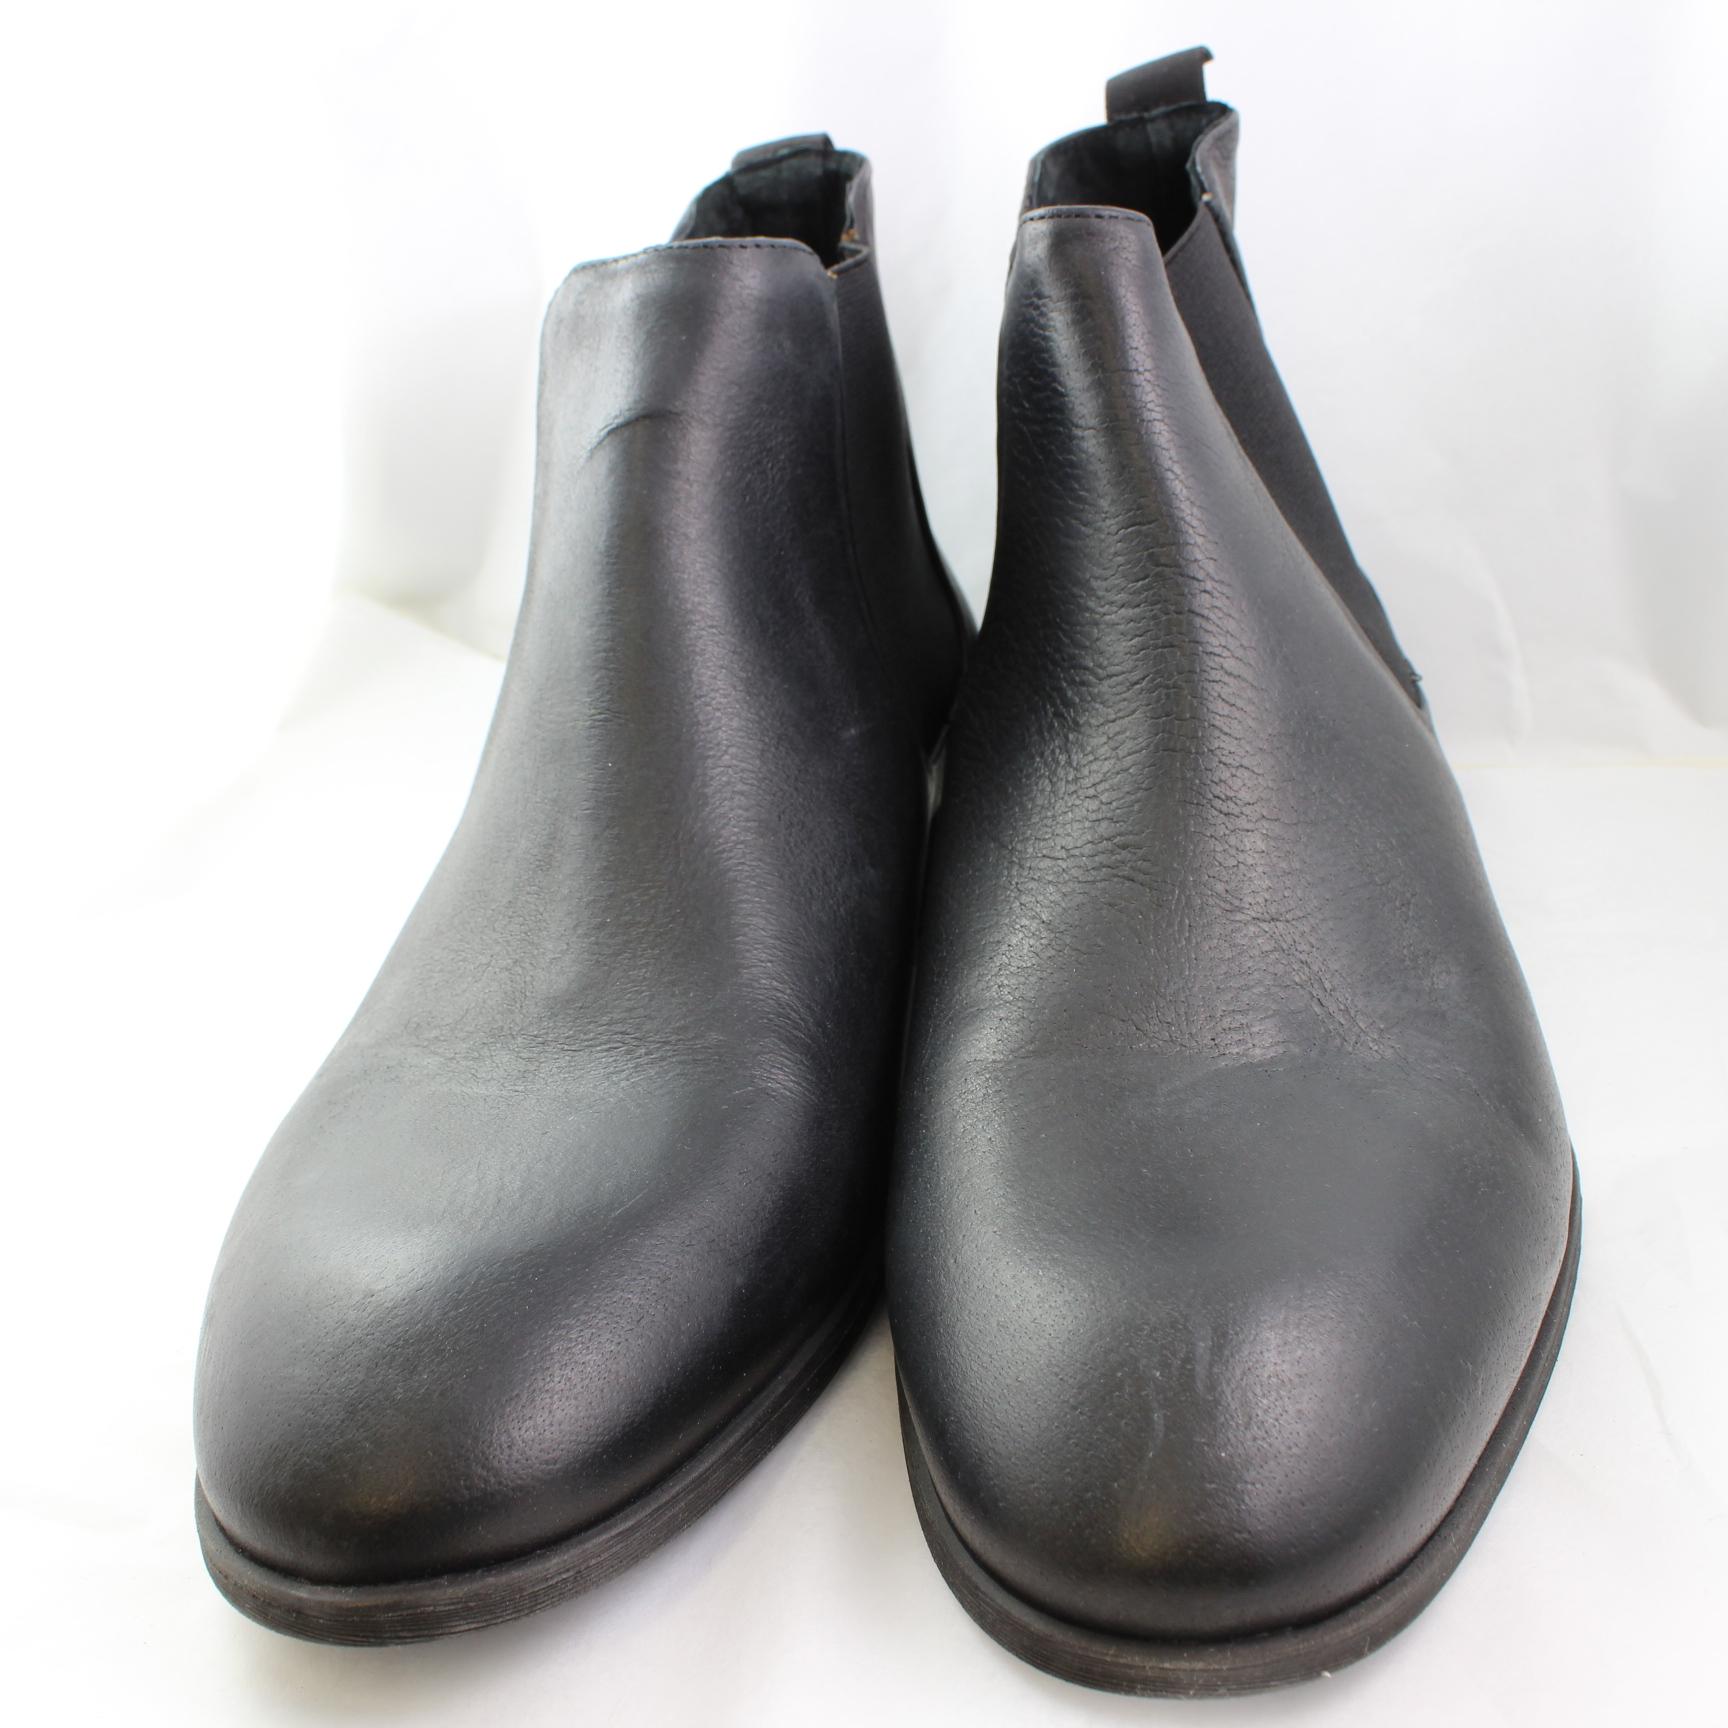 Hombre Ask Ask Ask the Missus Etta Chelsea botas Negro NUBUCK botas ba0b0d